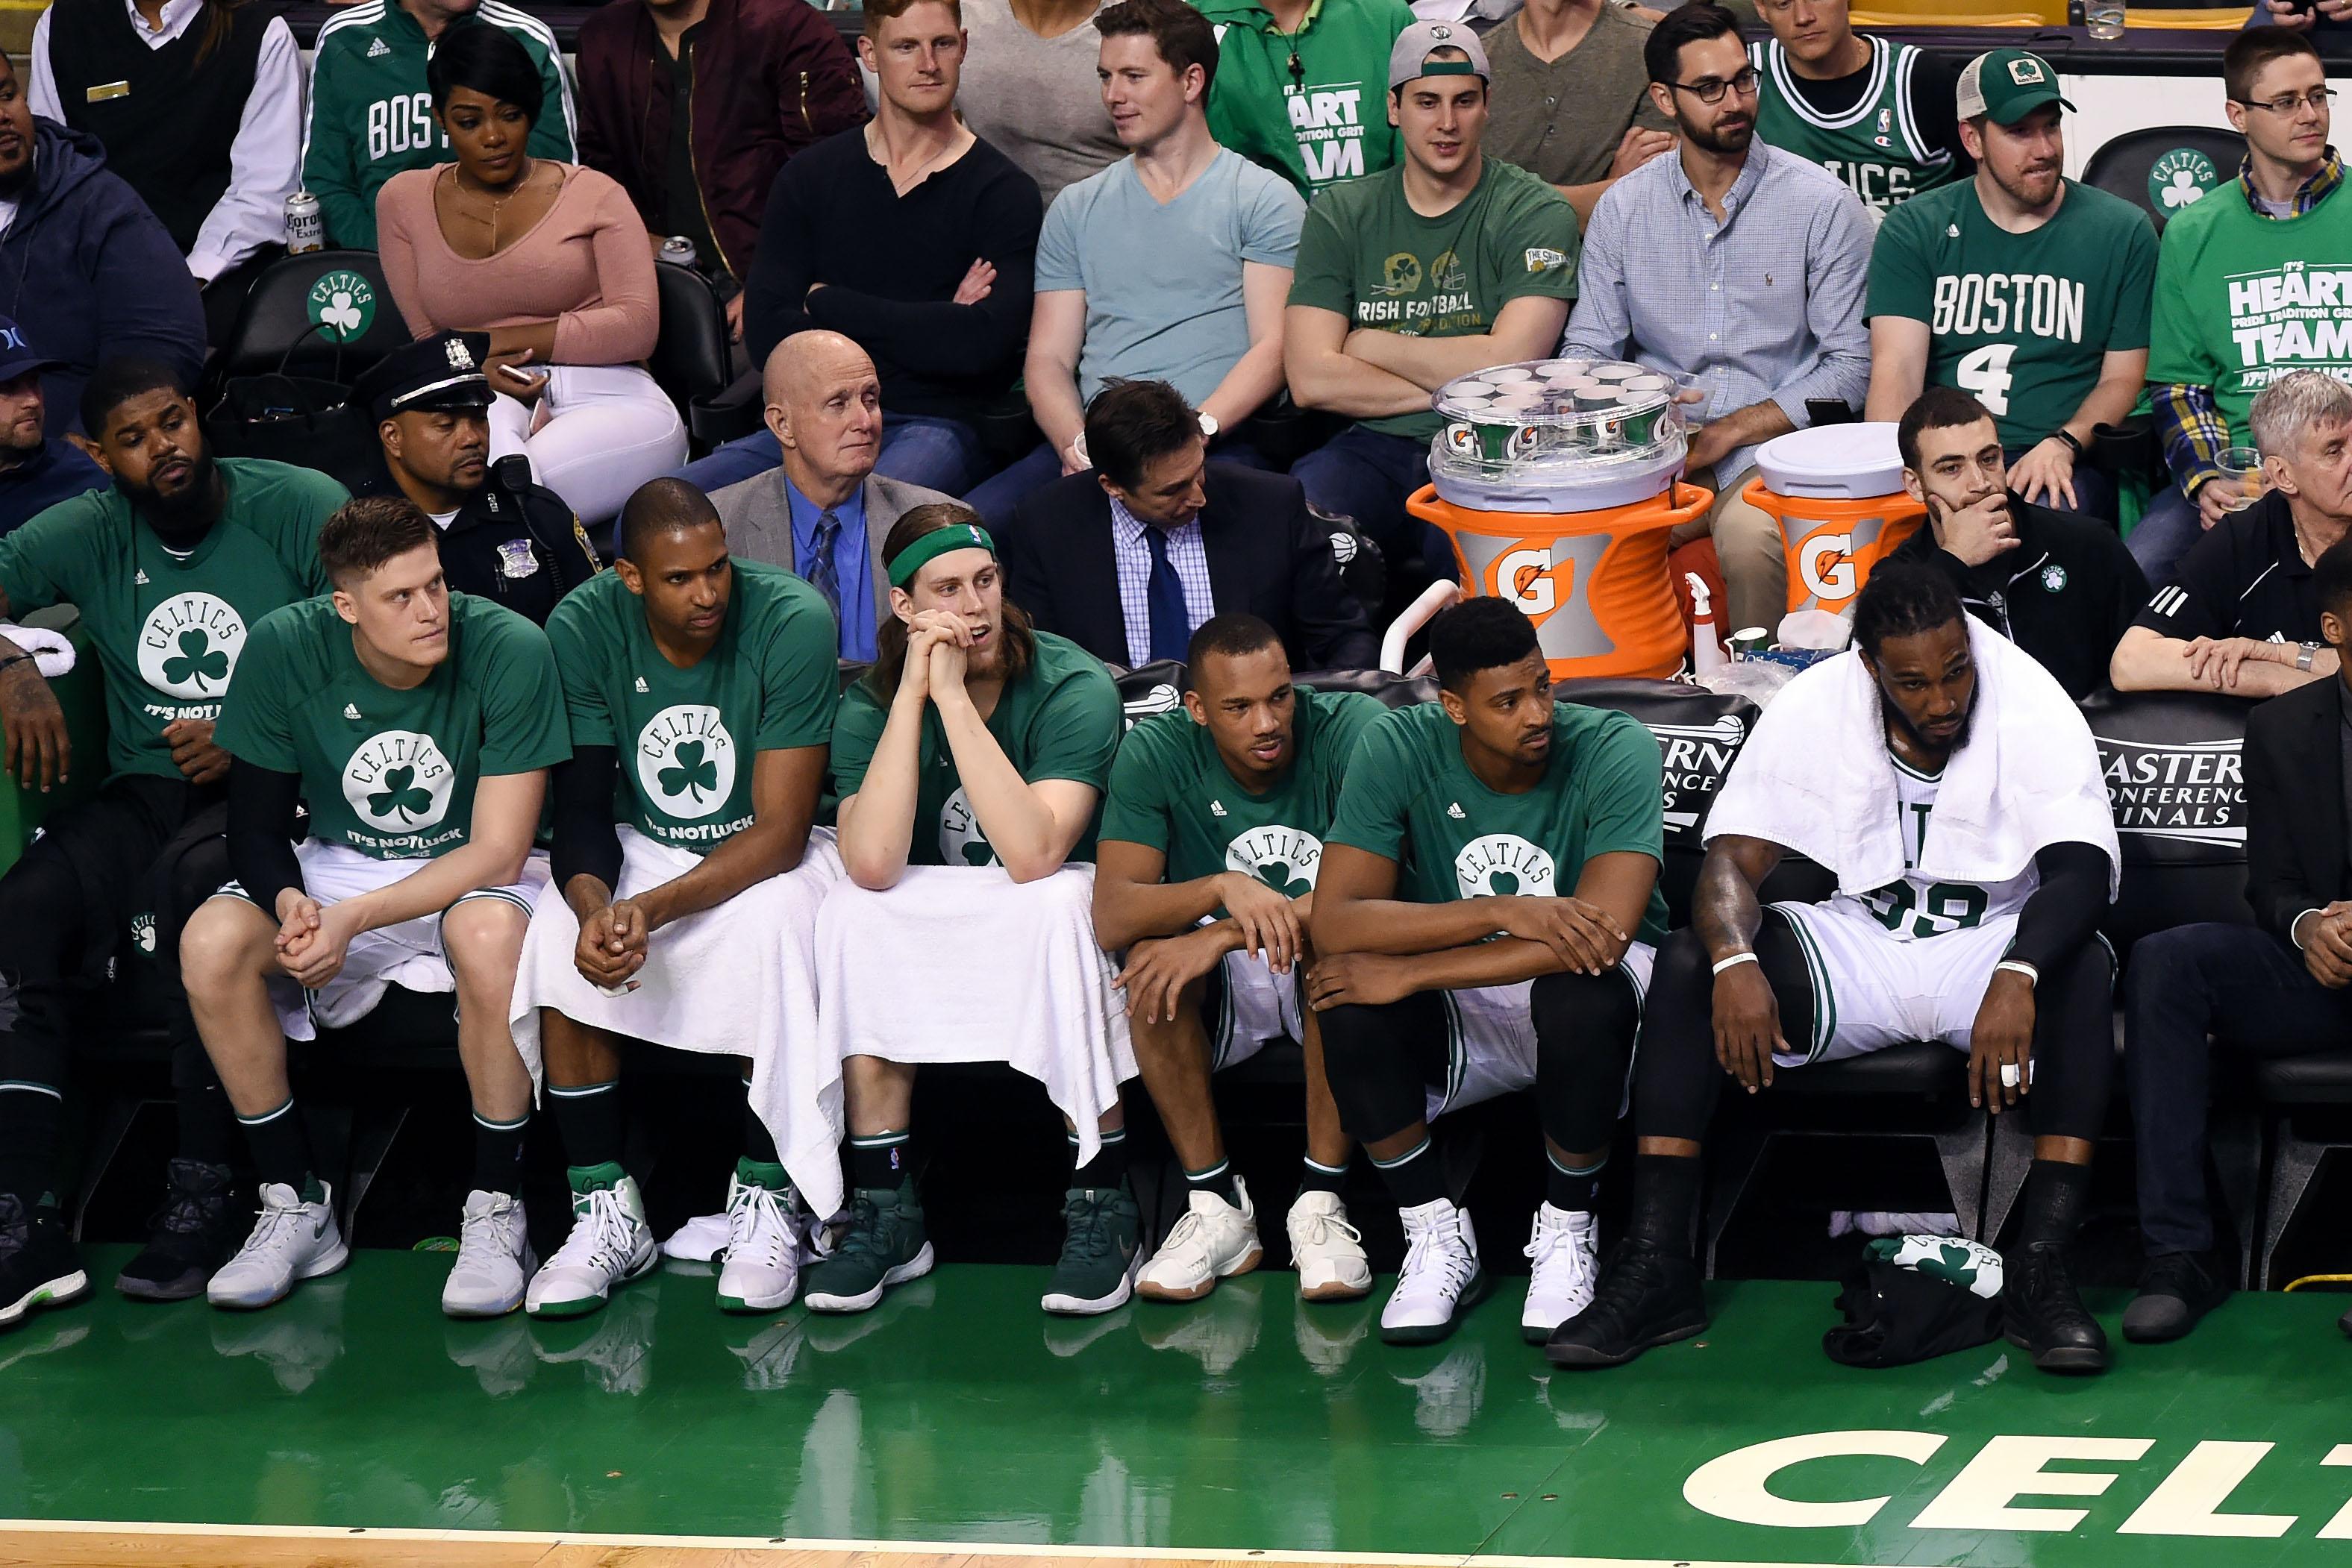 10073491-nba-playoffs-cleveland-cavaliers-at-boston-celtics